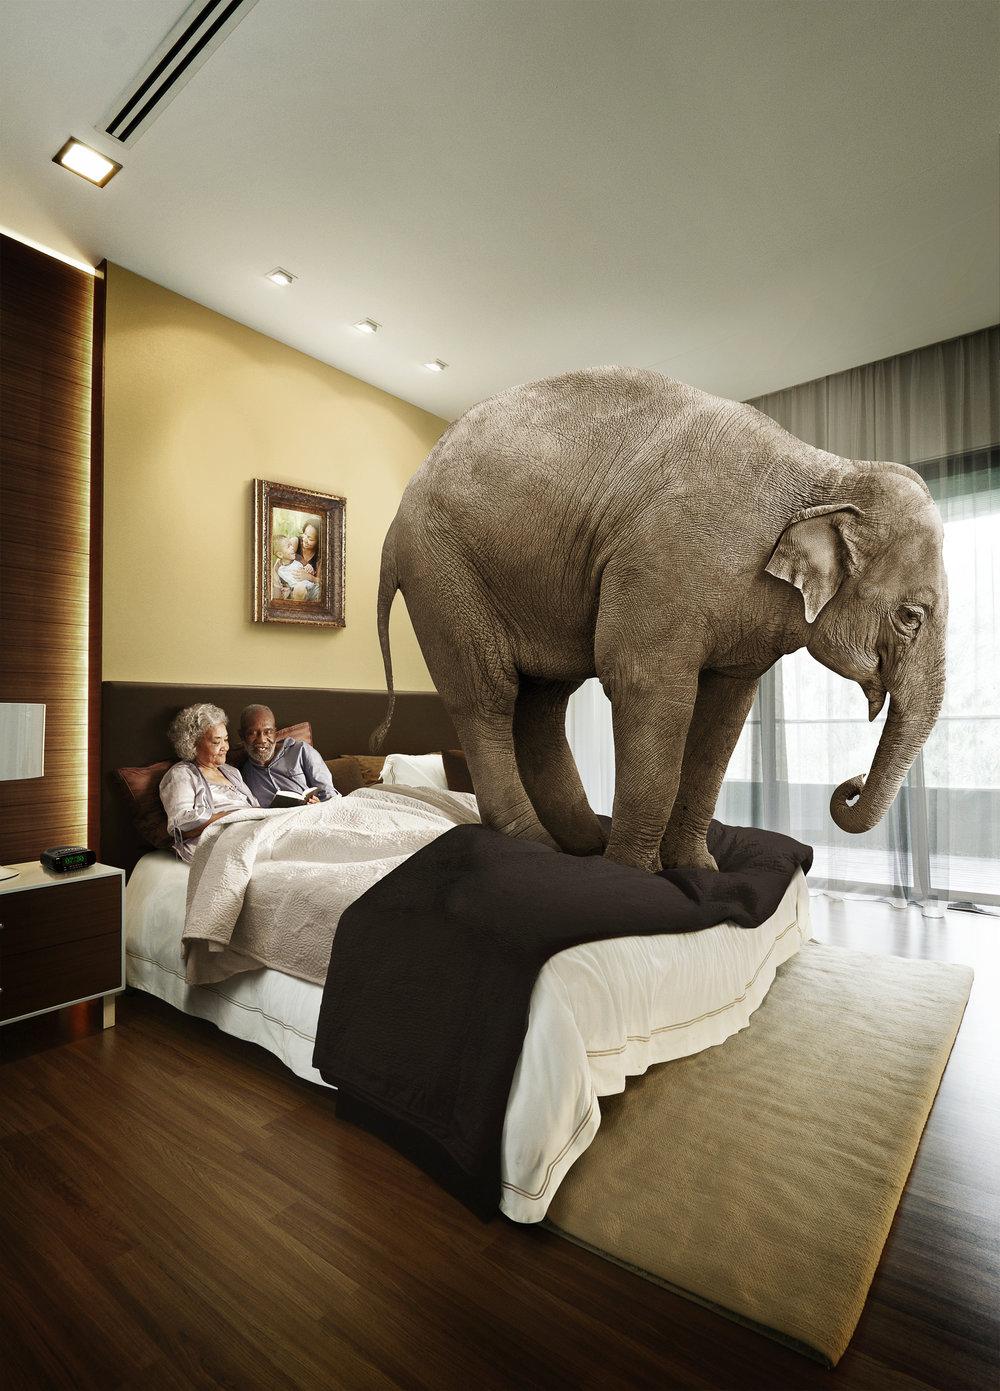 elephant_bedroom@465.jpg